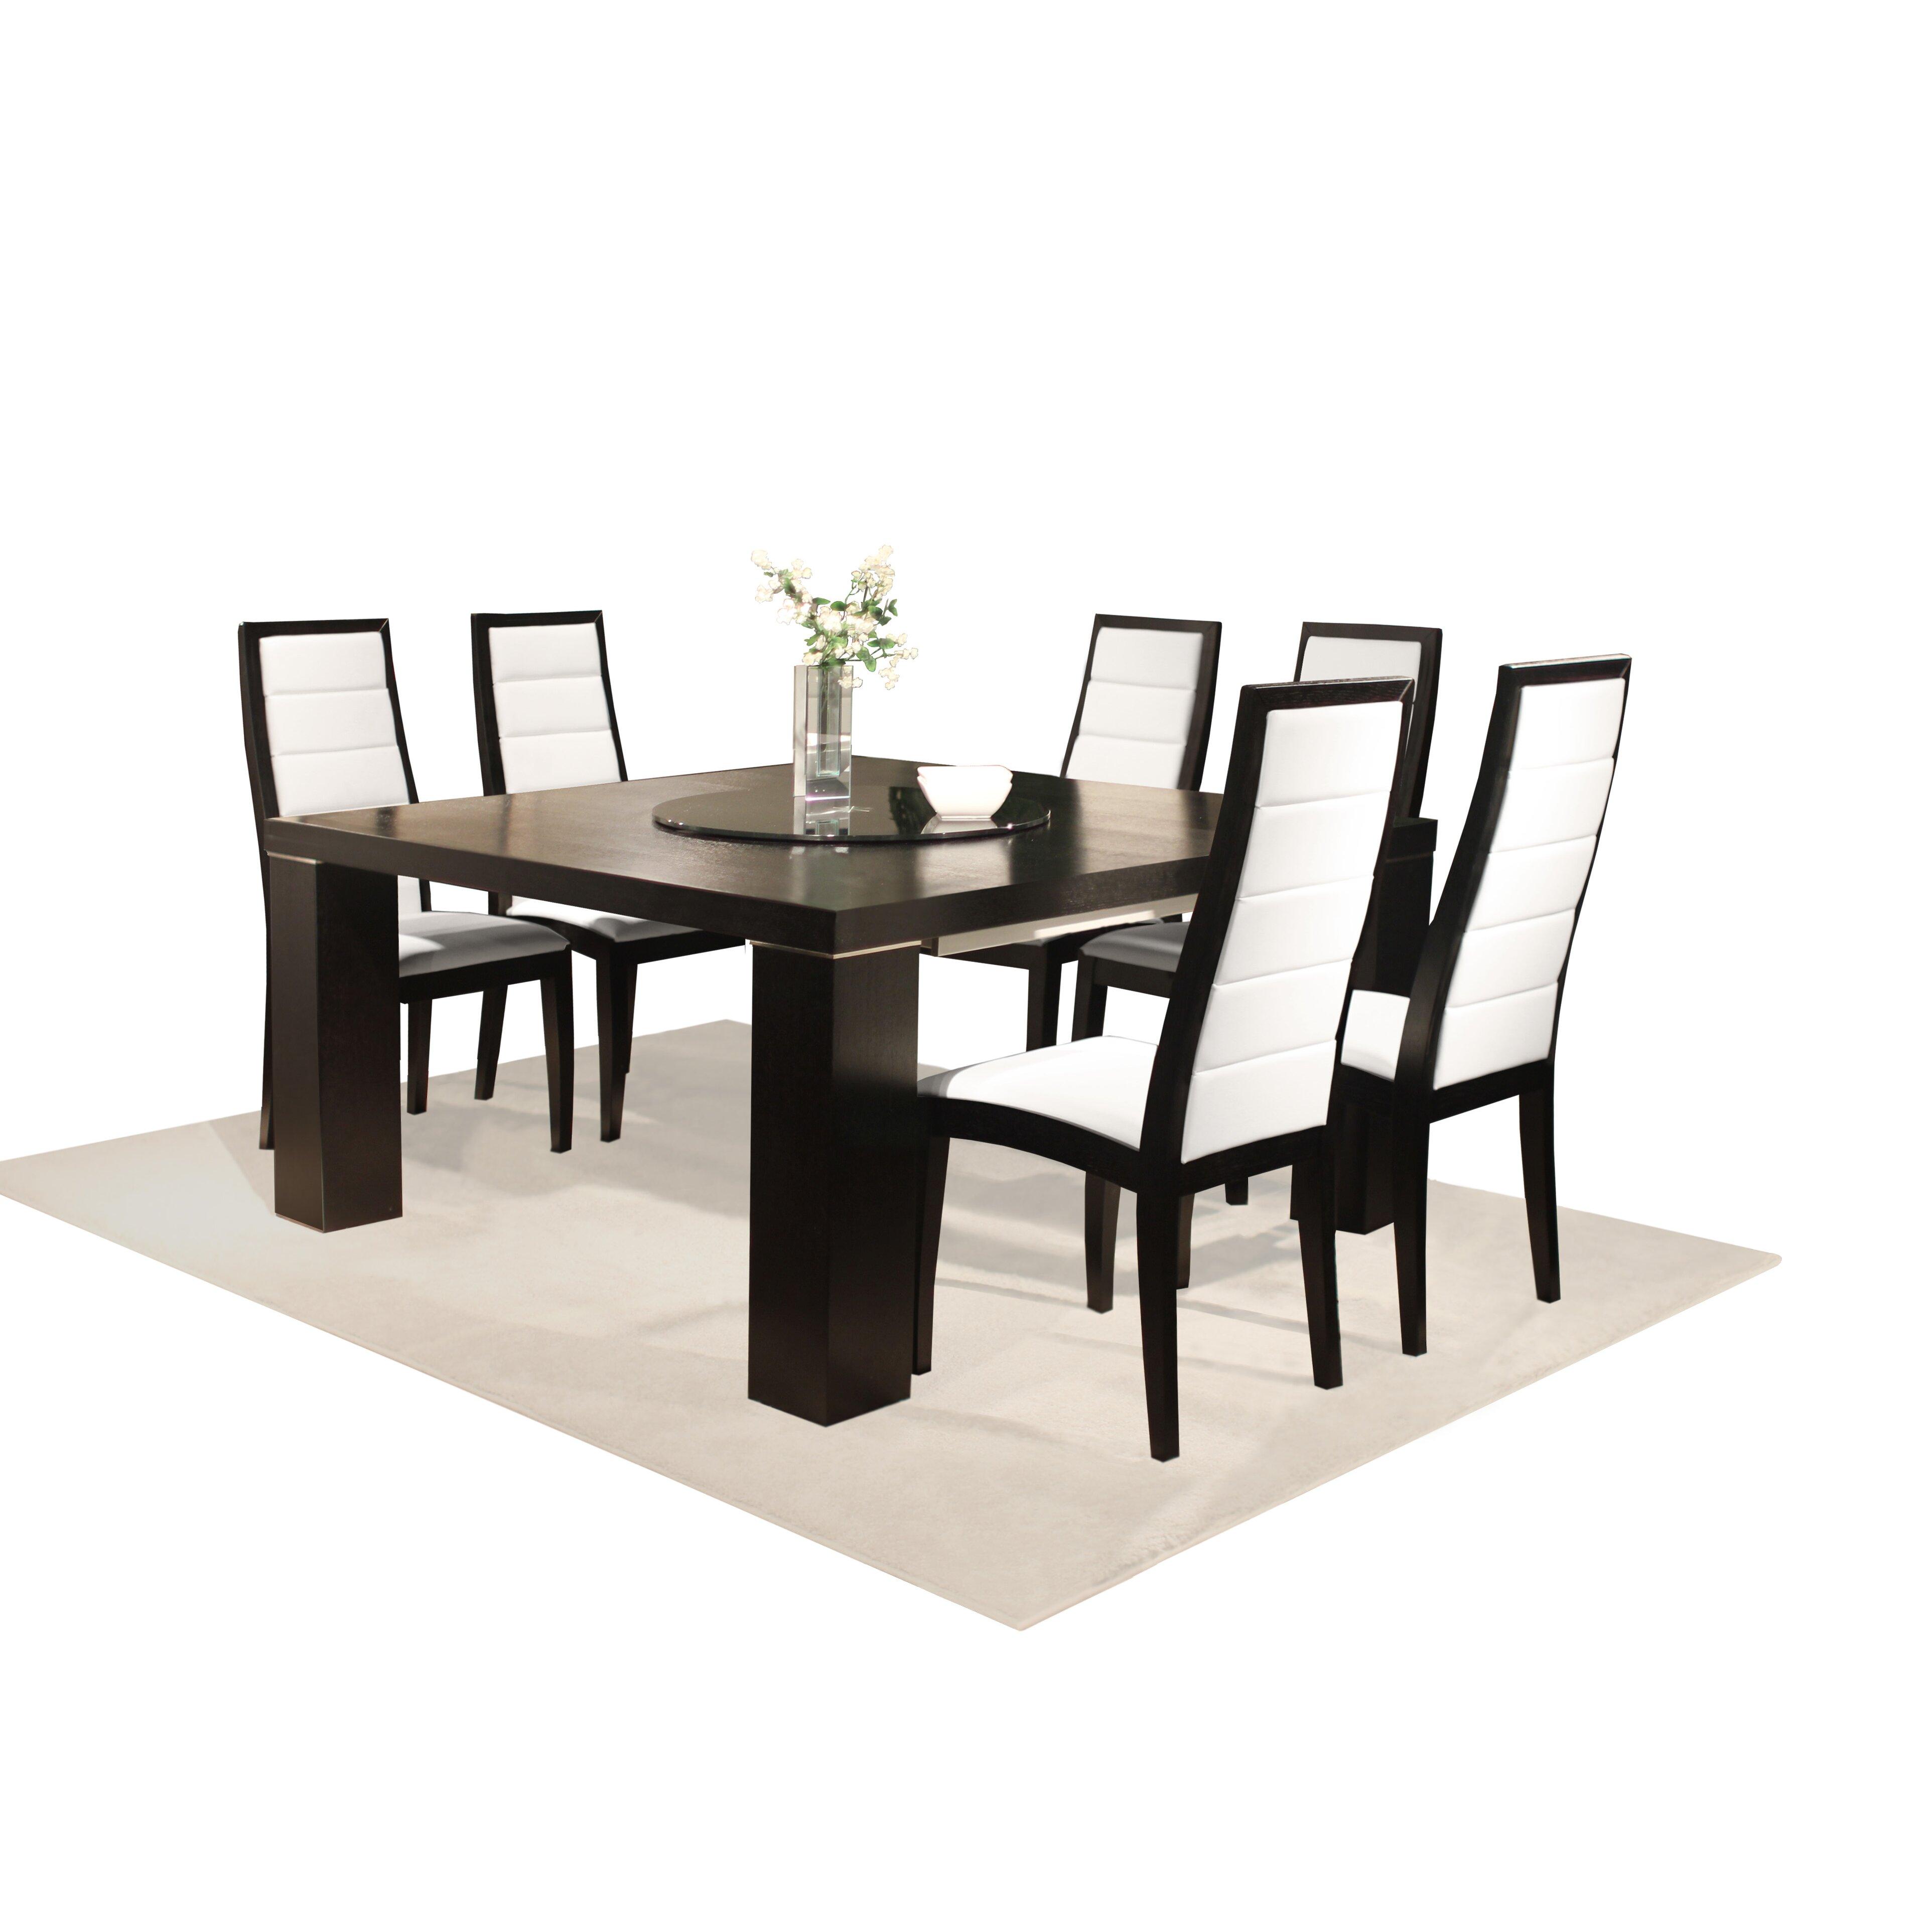 Jordan Dining Table By Sharelle Furnishings